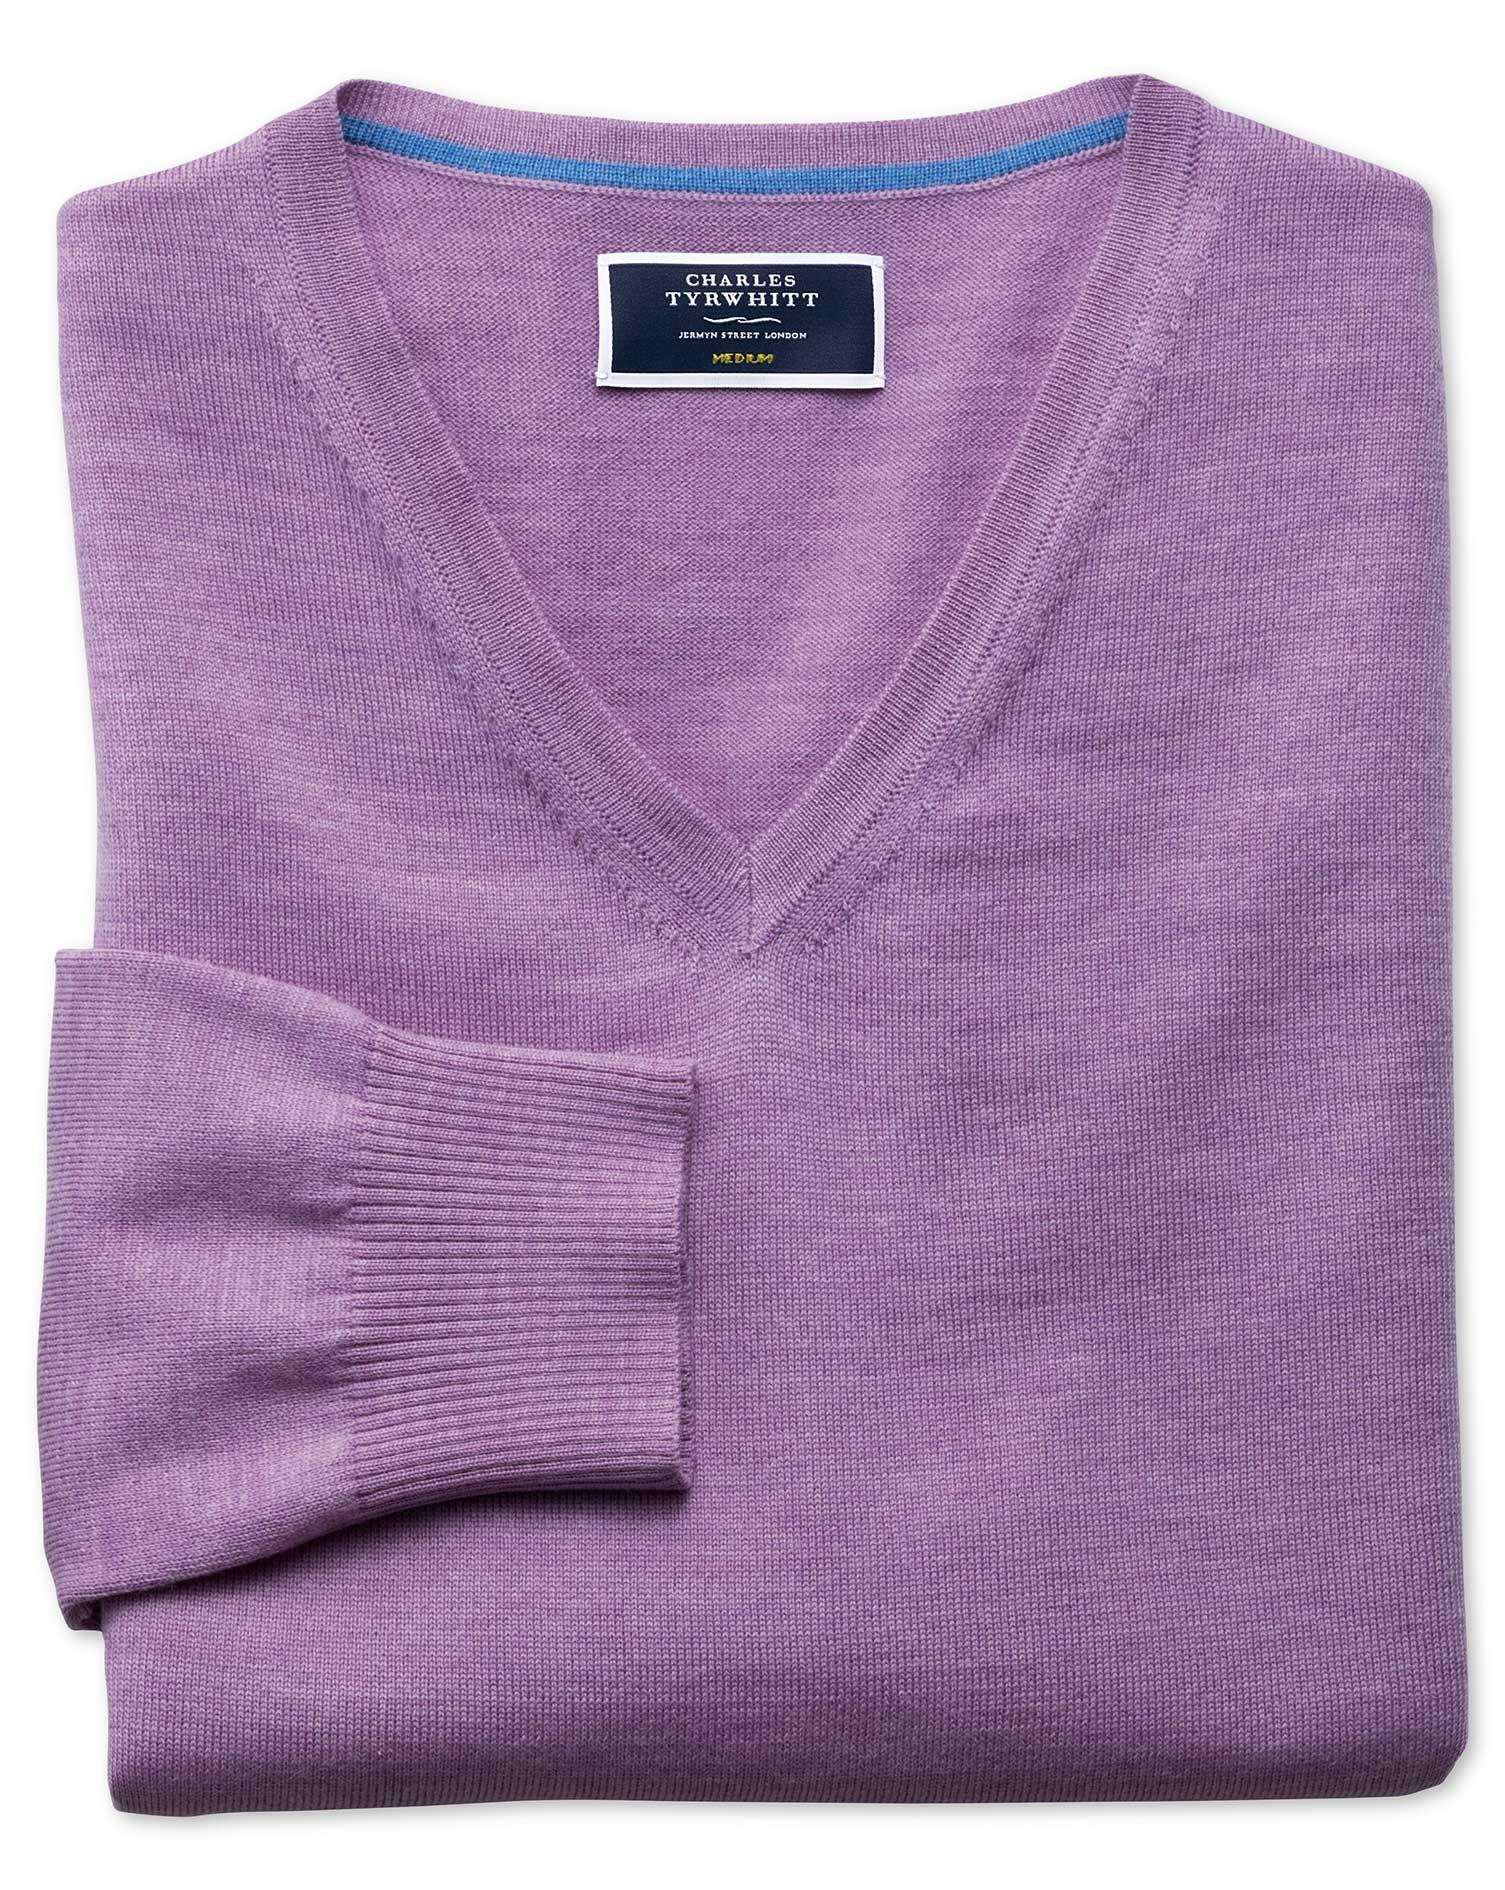 Lilac Merino Wool V-Neck Jumper Size XS by Charles Tyrwhitt